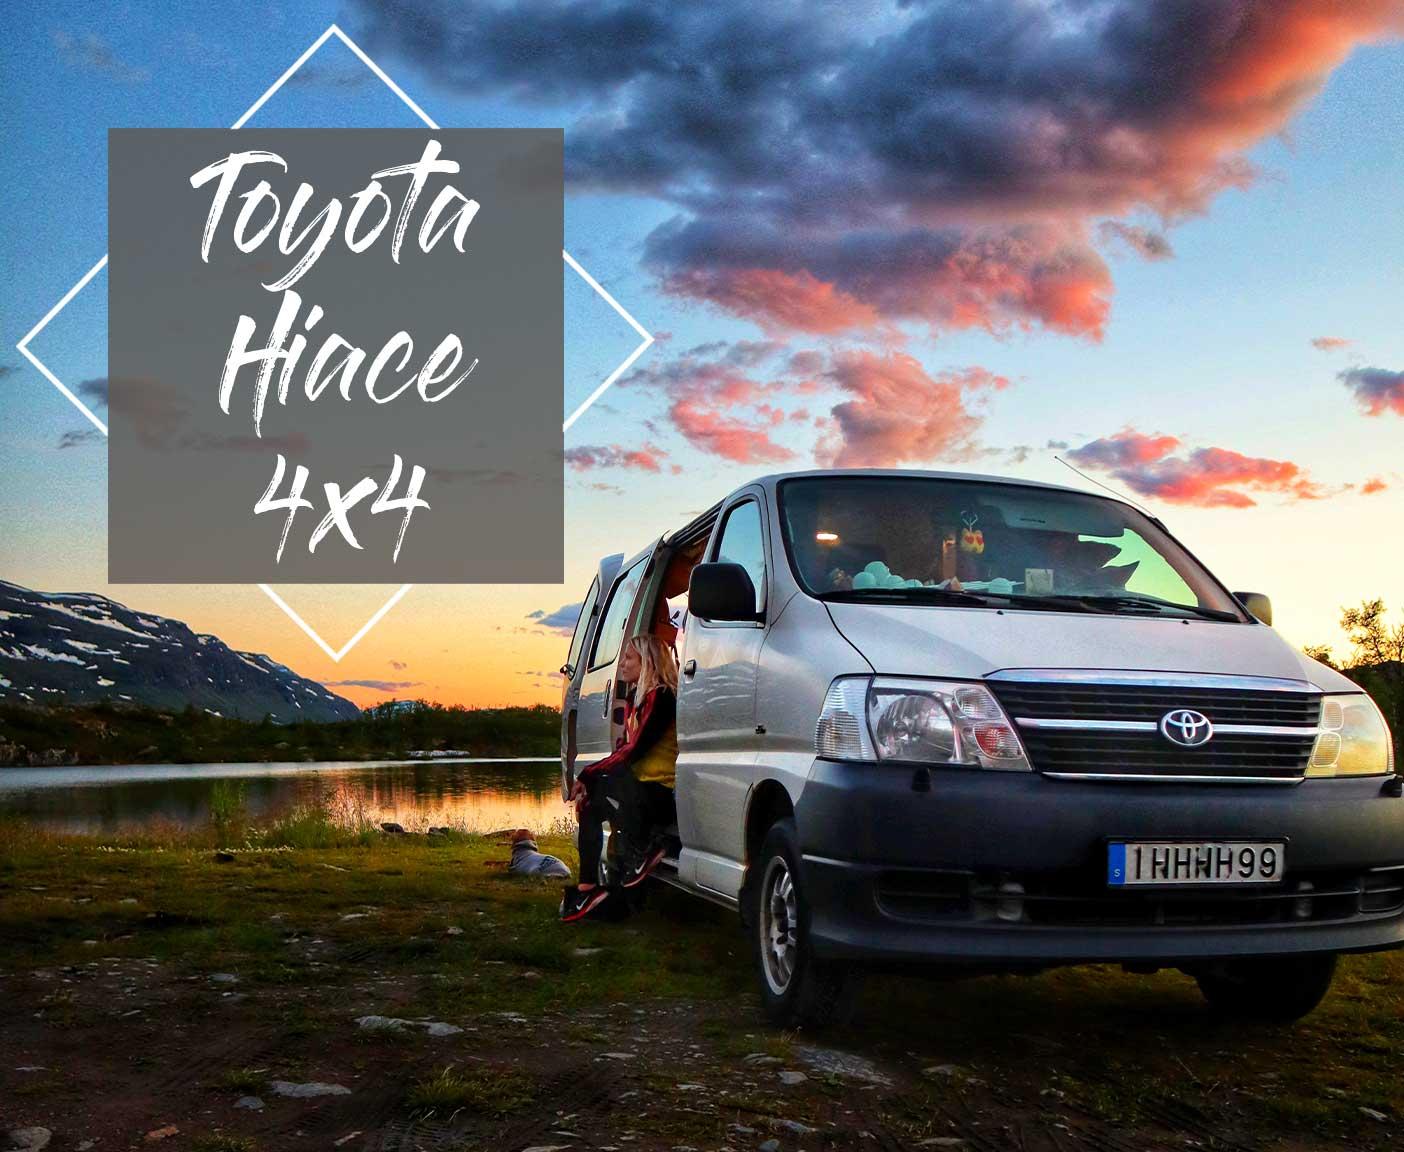 Toyota-Hiace-4x4-kaufen-ausbau-vanlife